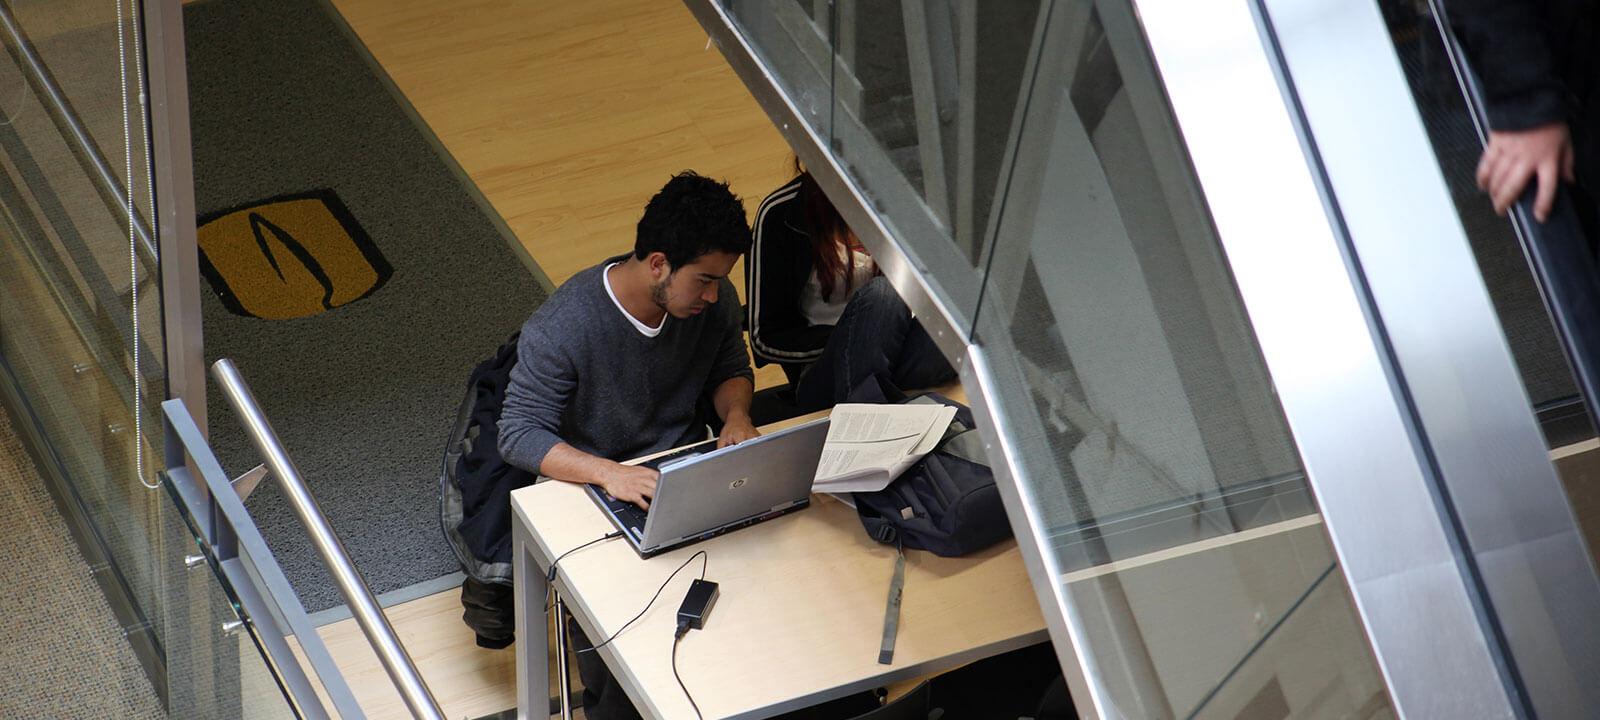 Study at Uniandes